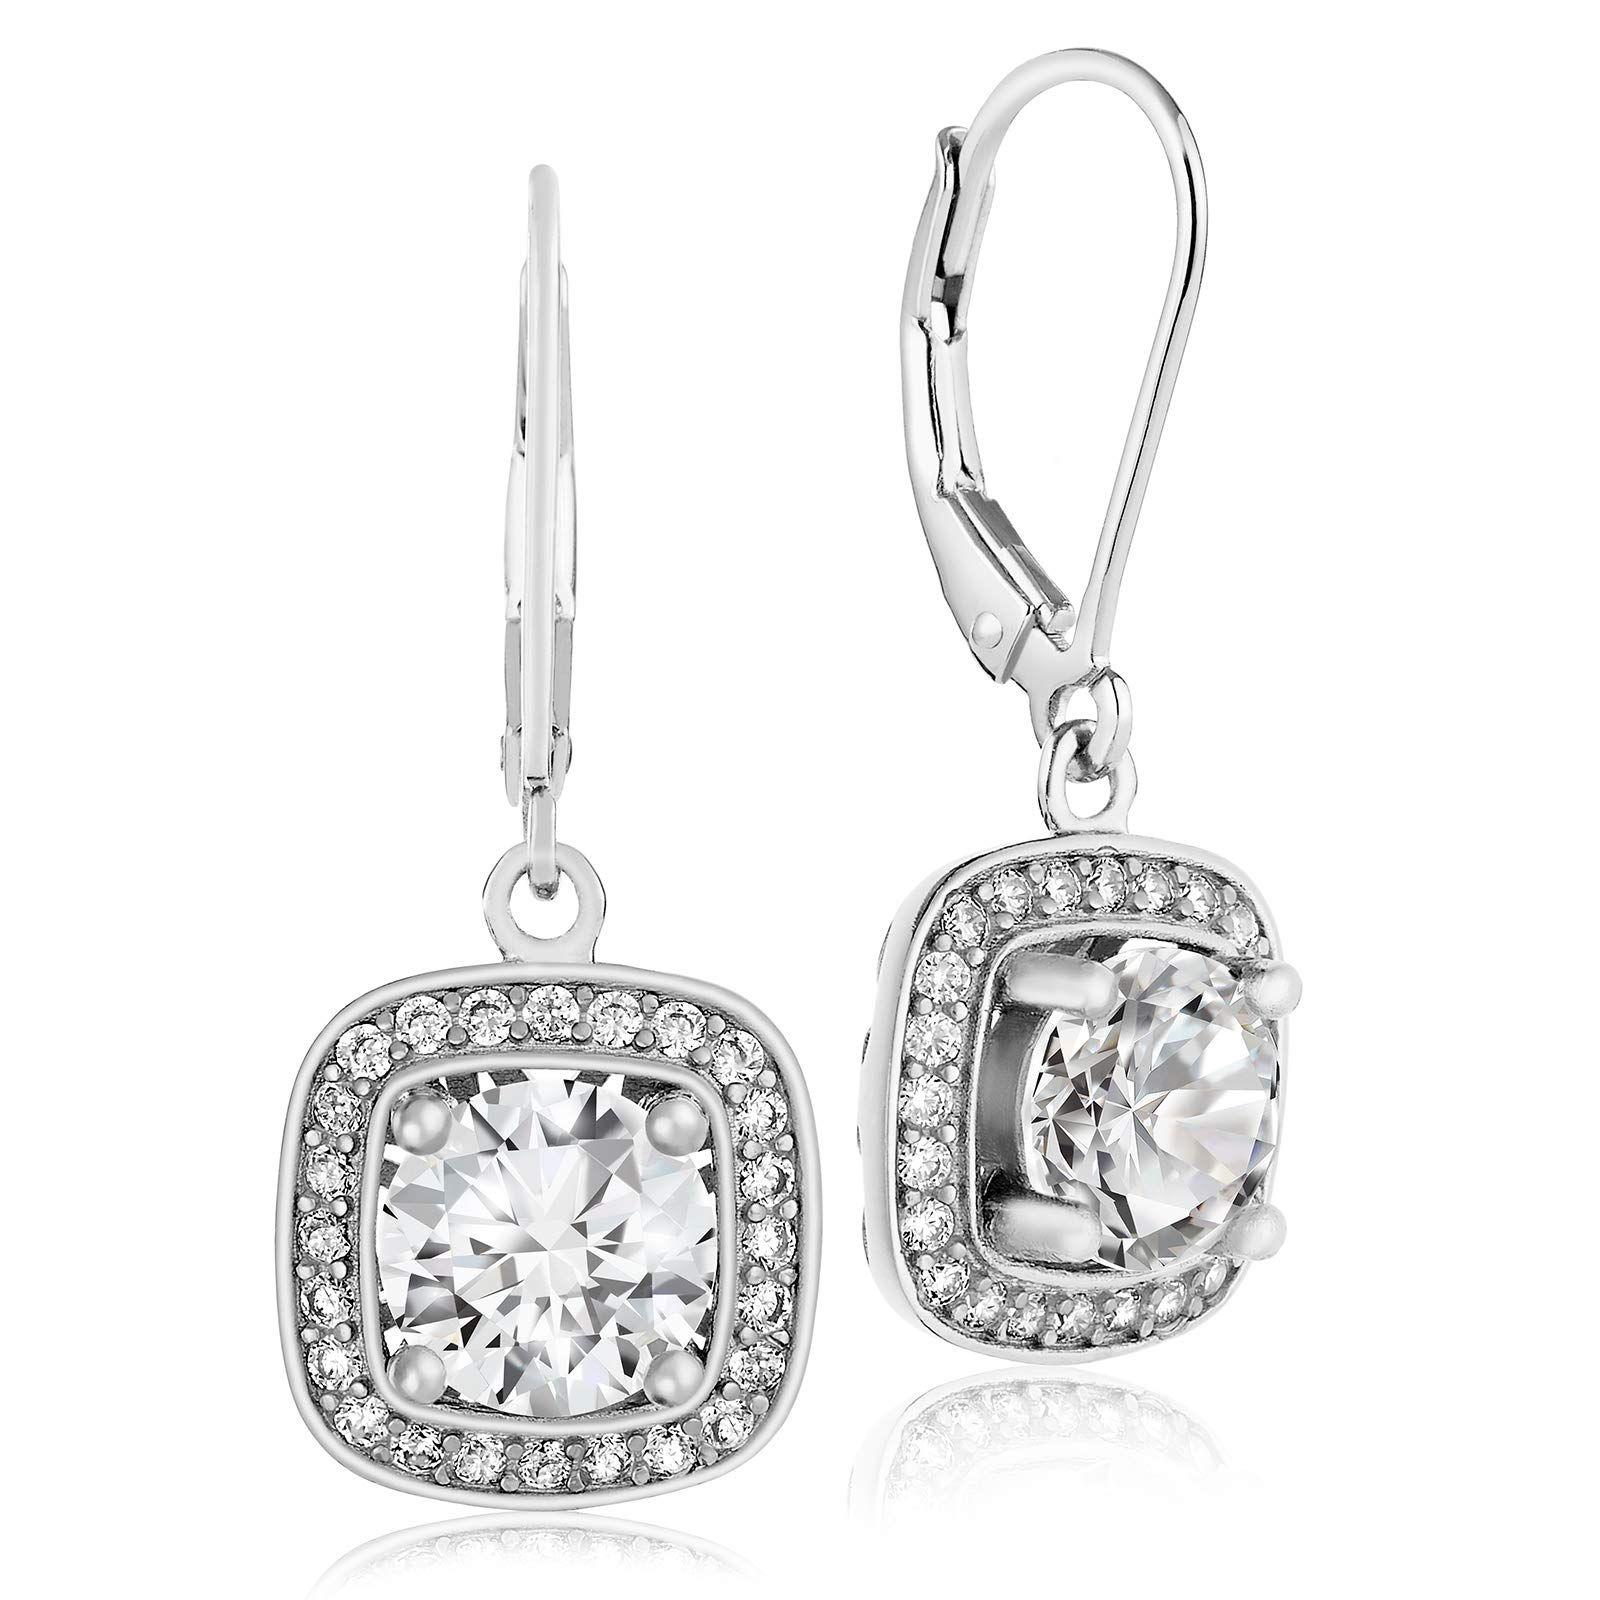 Round Cubic Zirconia Drop Dangle Earrings Leverback Wedding Jewelry Gift 1 Pair